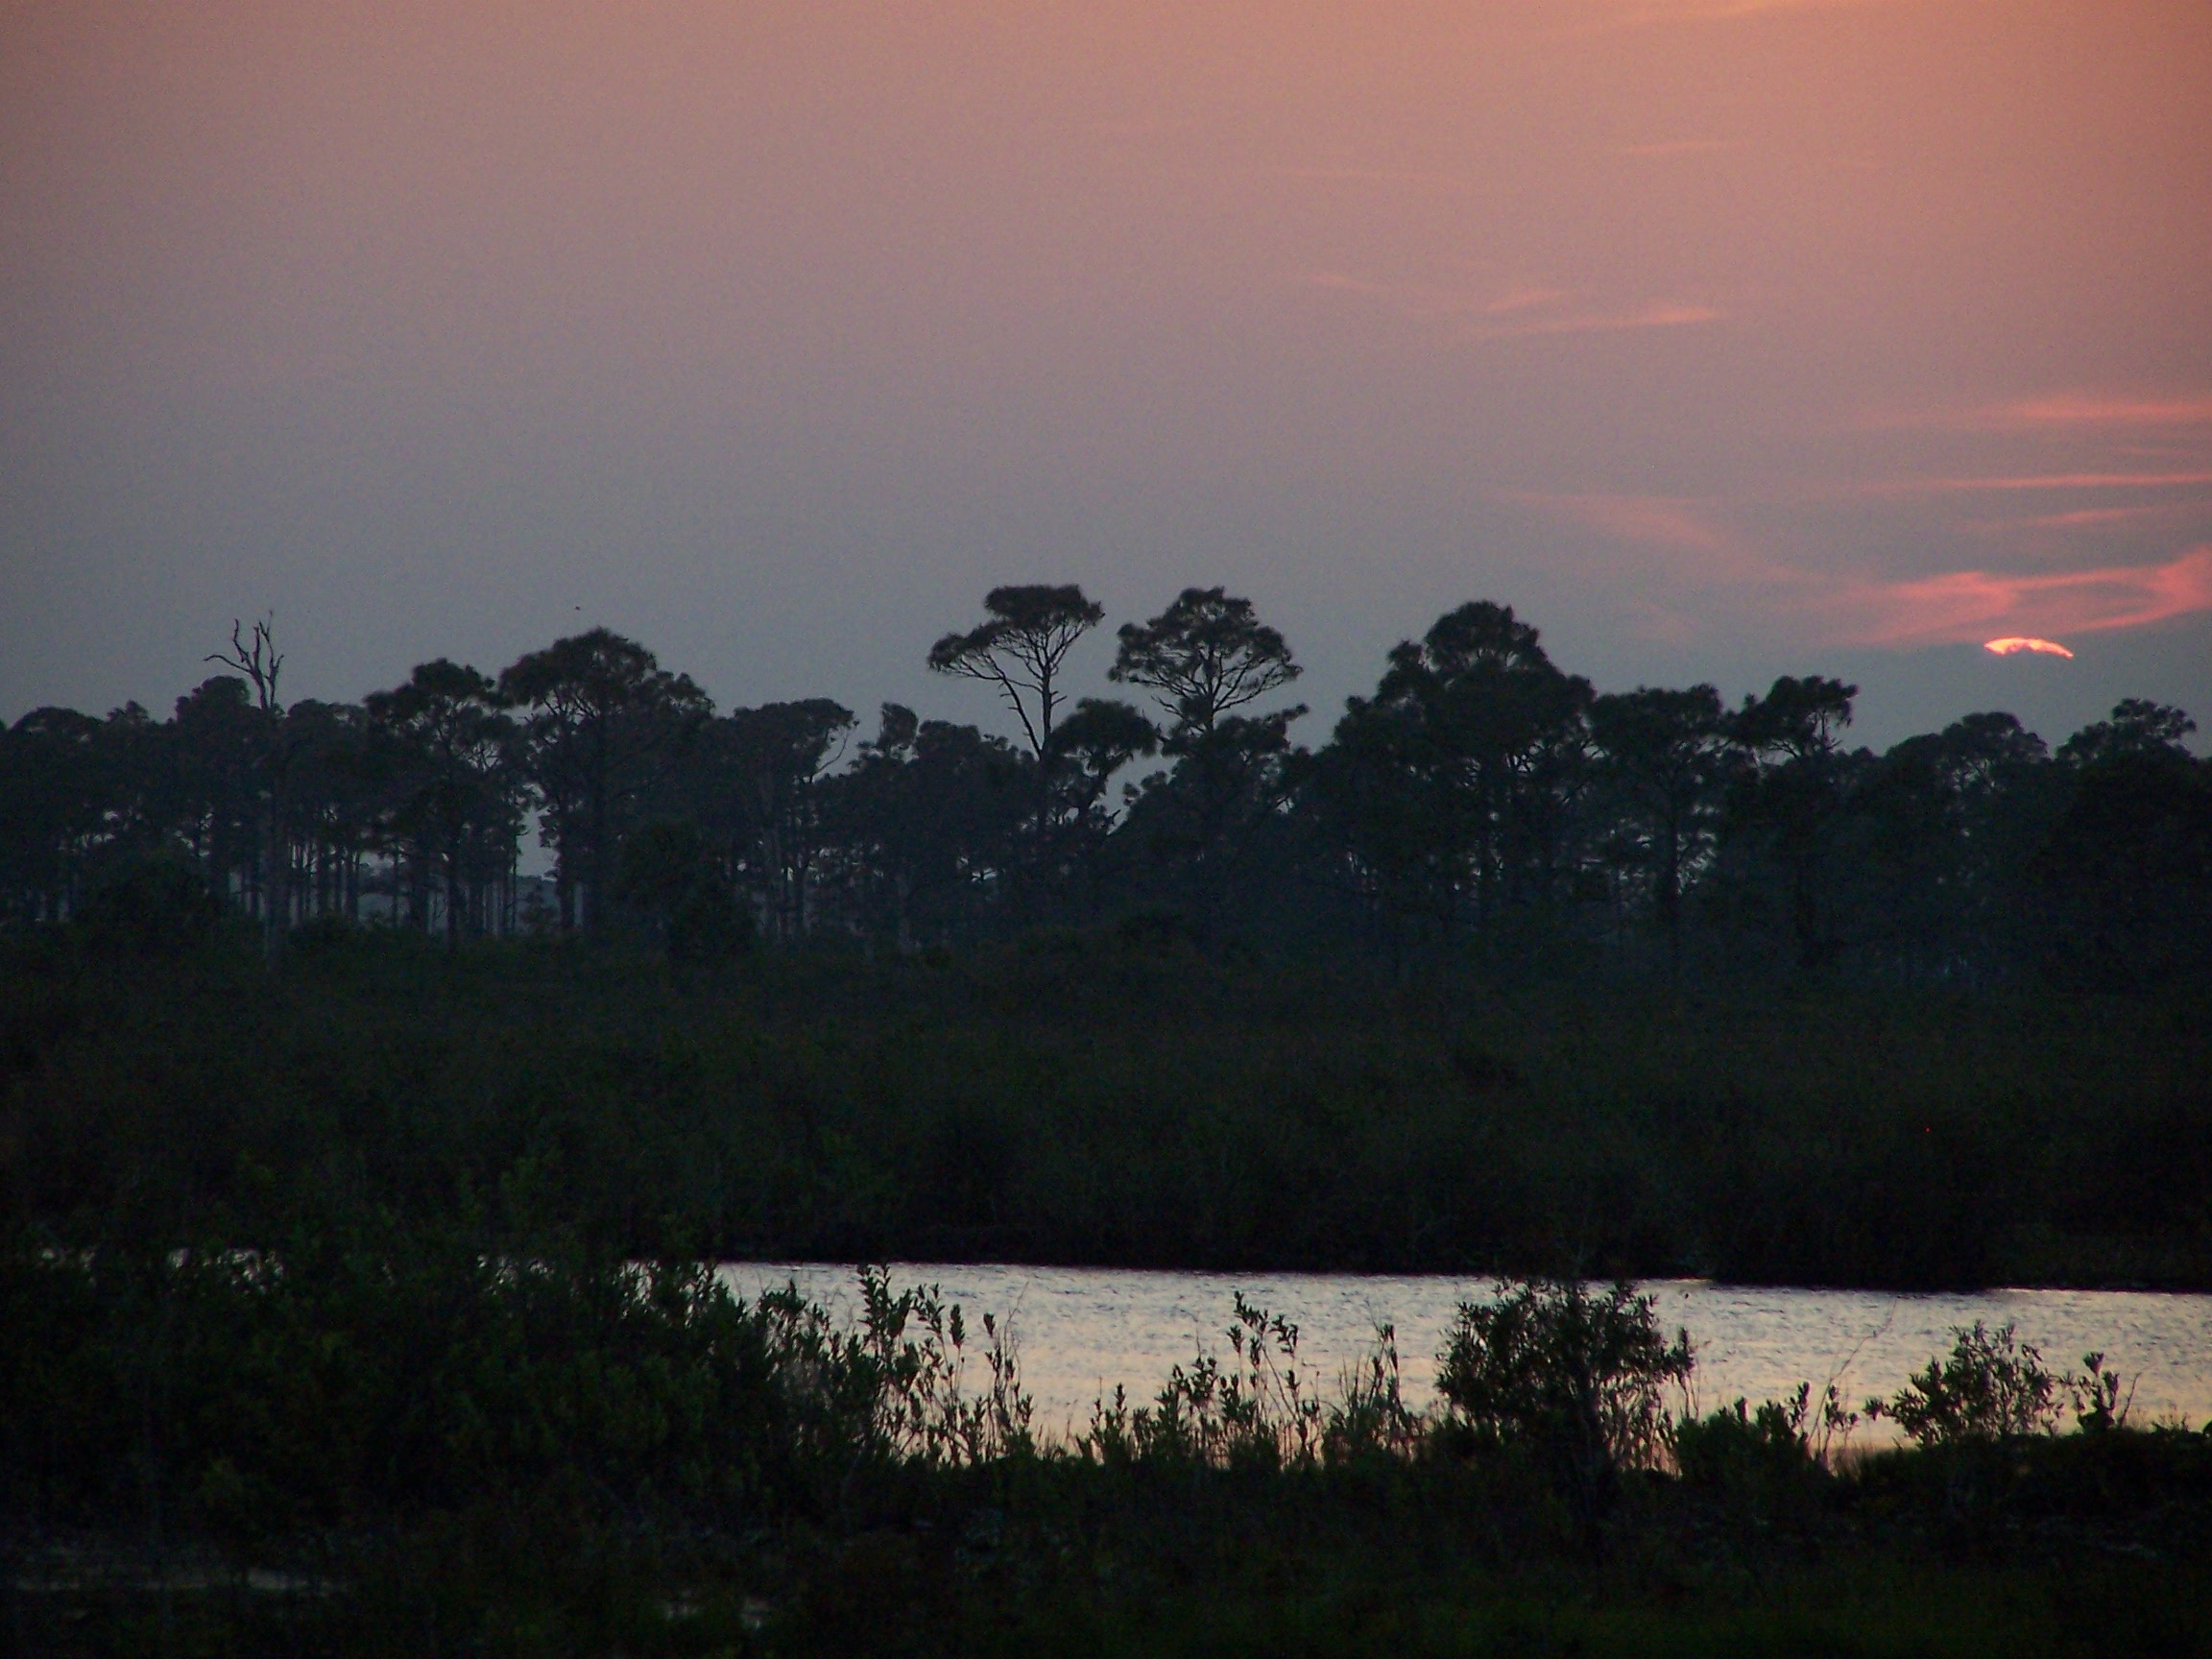 Sunset on the Savannas (Lori Burris)